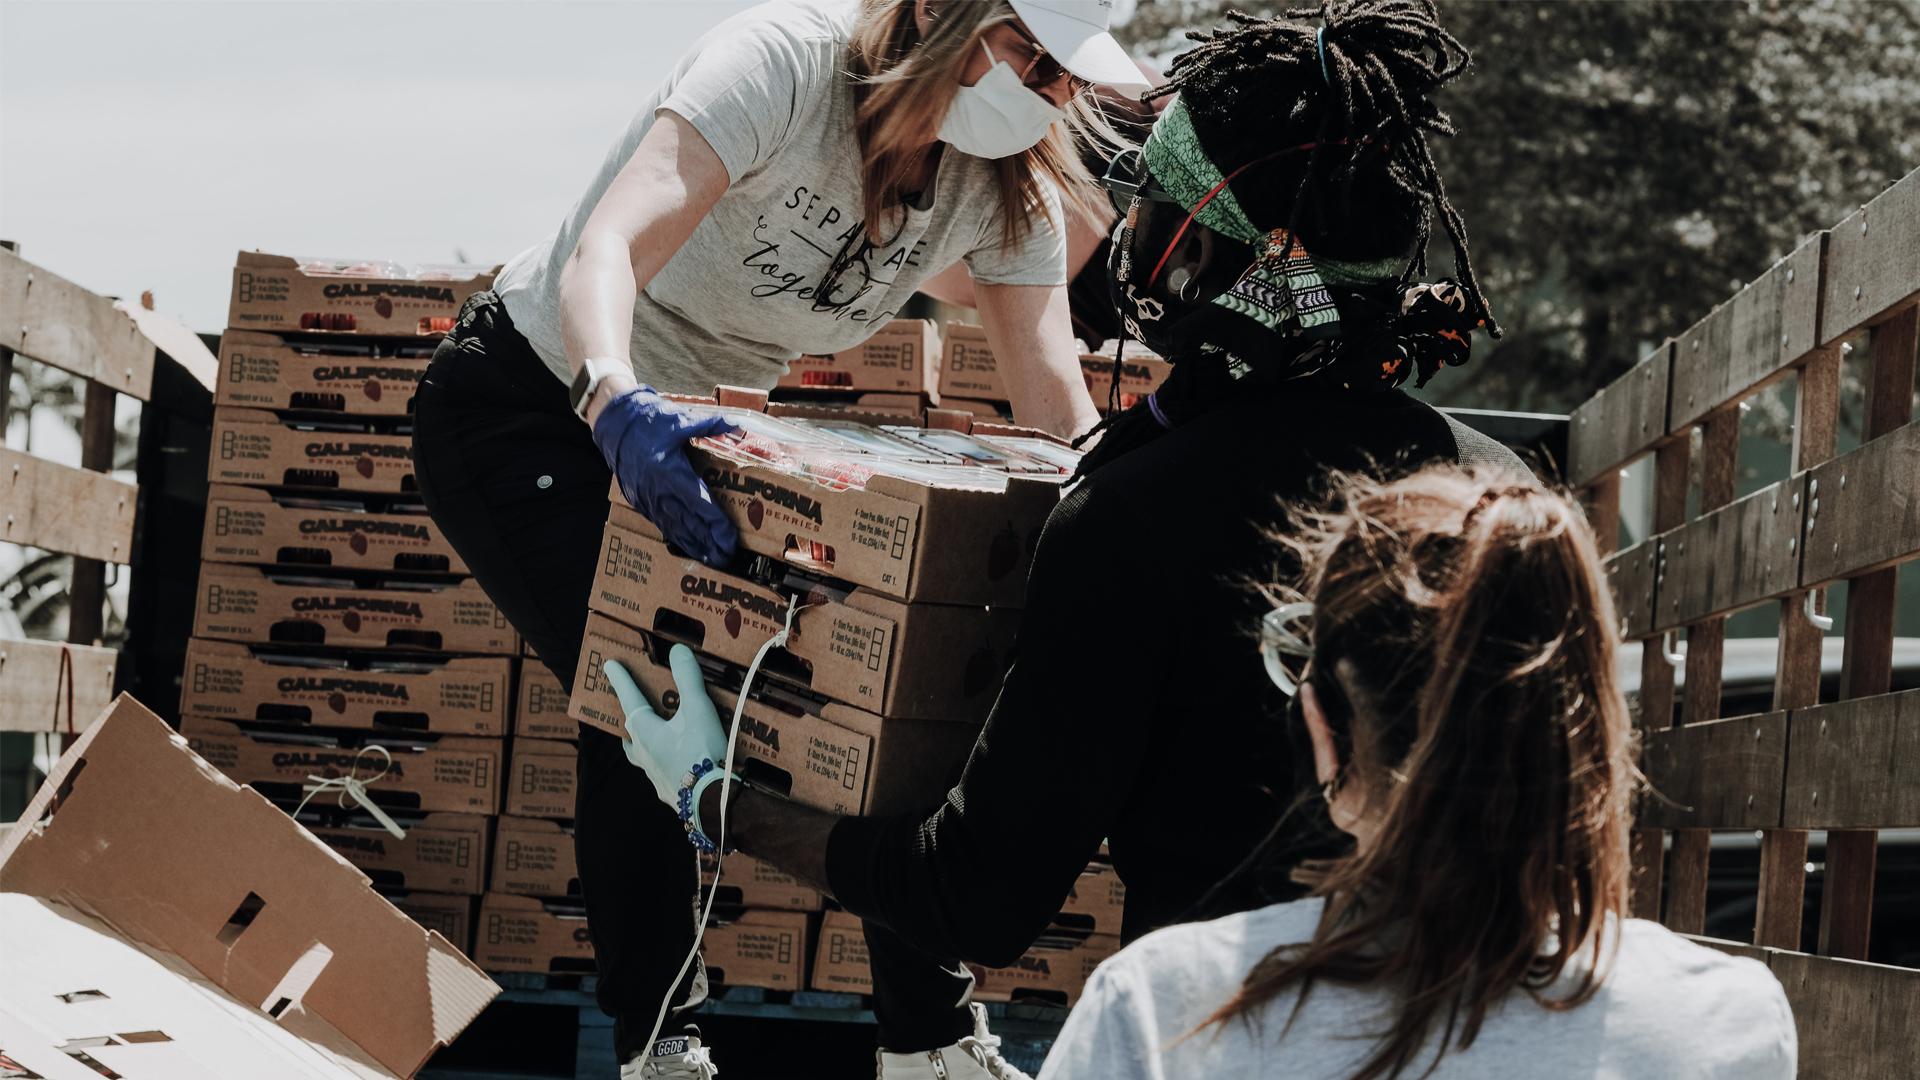 Volunteering Helps New Grads Gain Experience